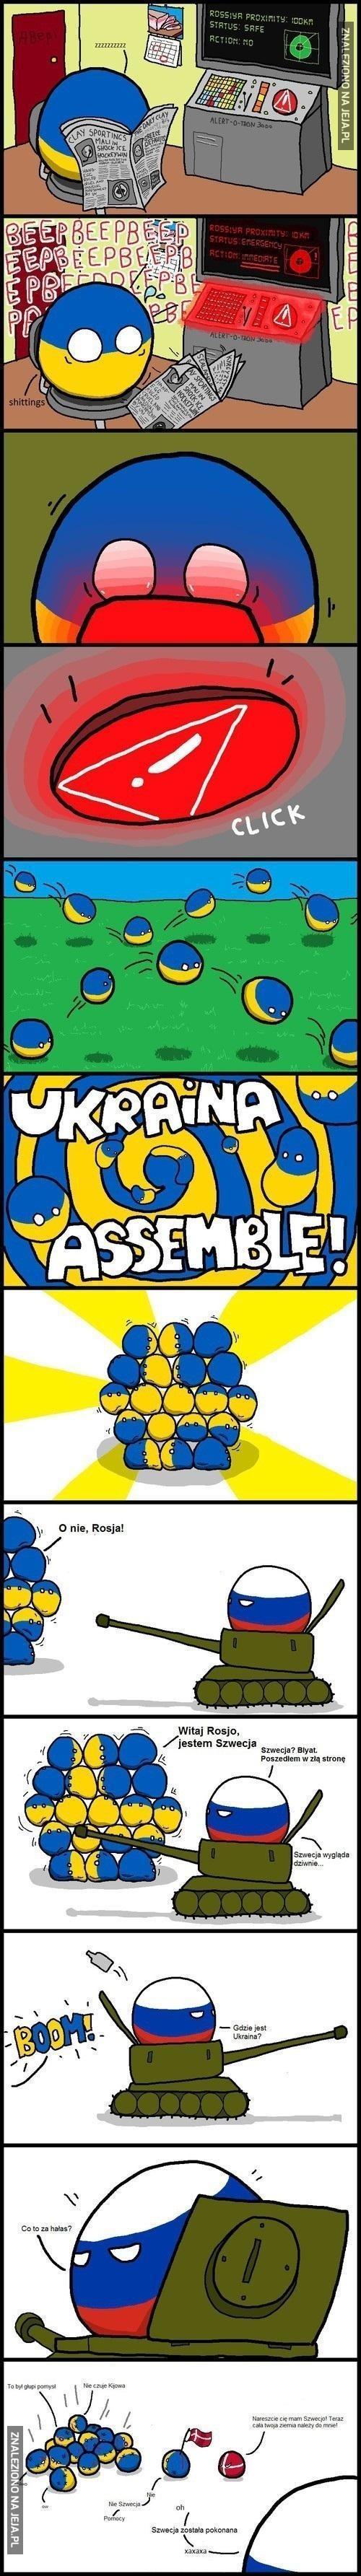 Plan awaryjny Ukrainy